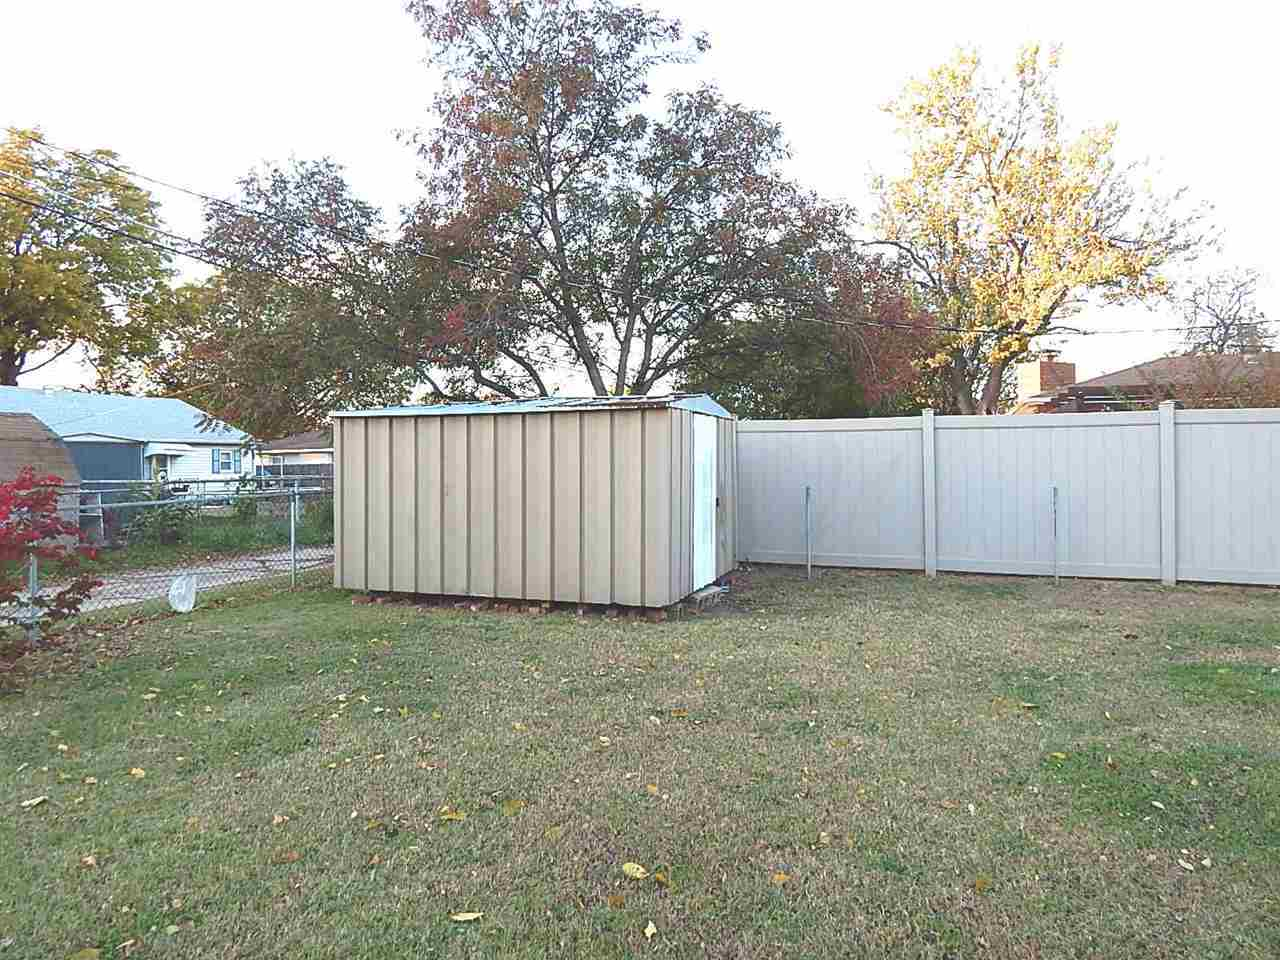 Sold Intraoffice W/MLS | 2226 Garden Ponca City, OK 74601 14